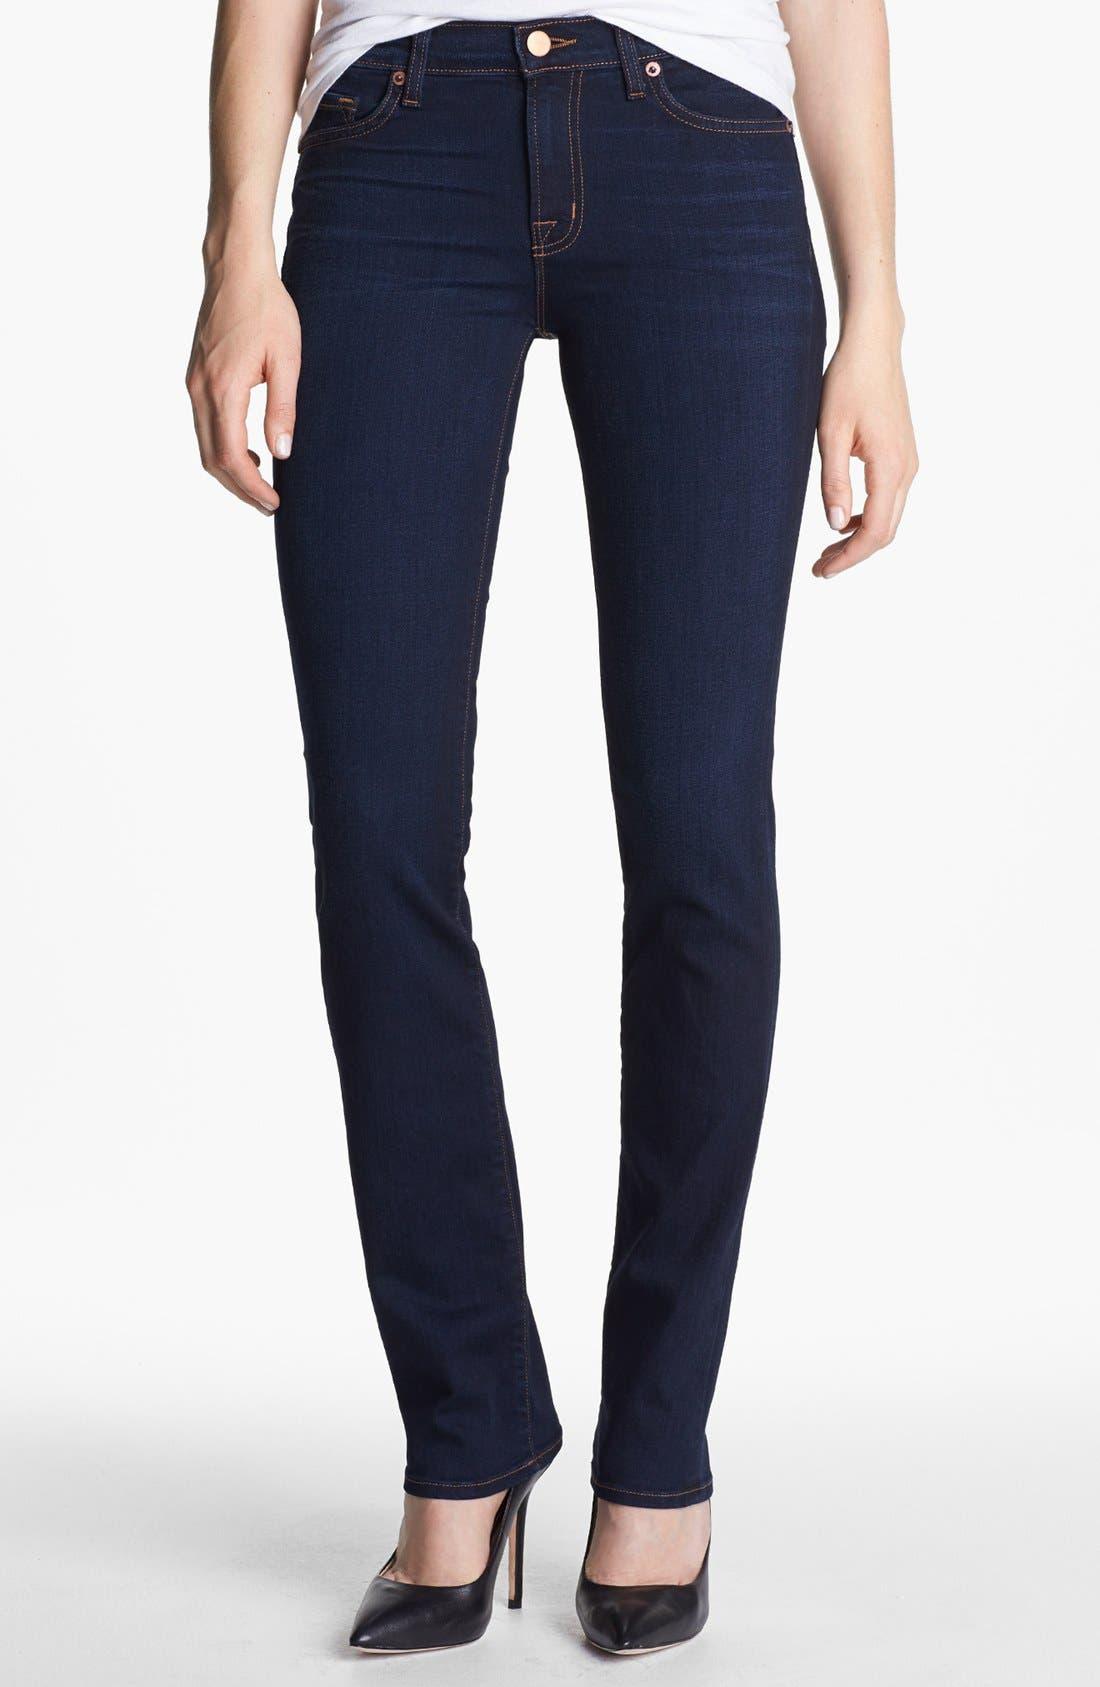 Main Image - J Brand '814' Mid-Rise Cigarette Leg Jeans (Ignite)